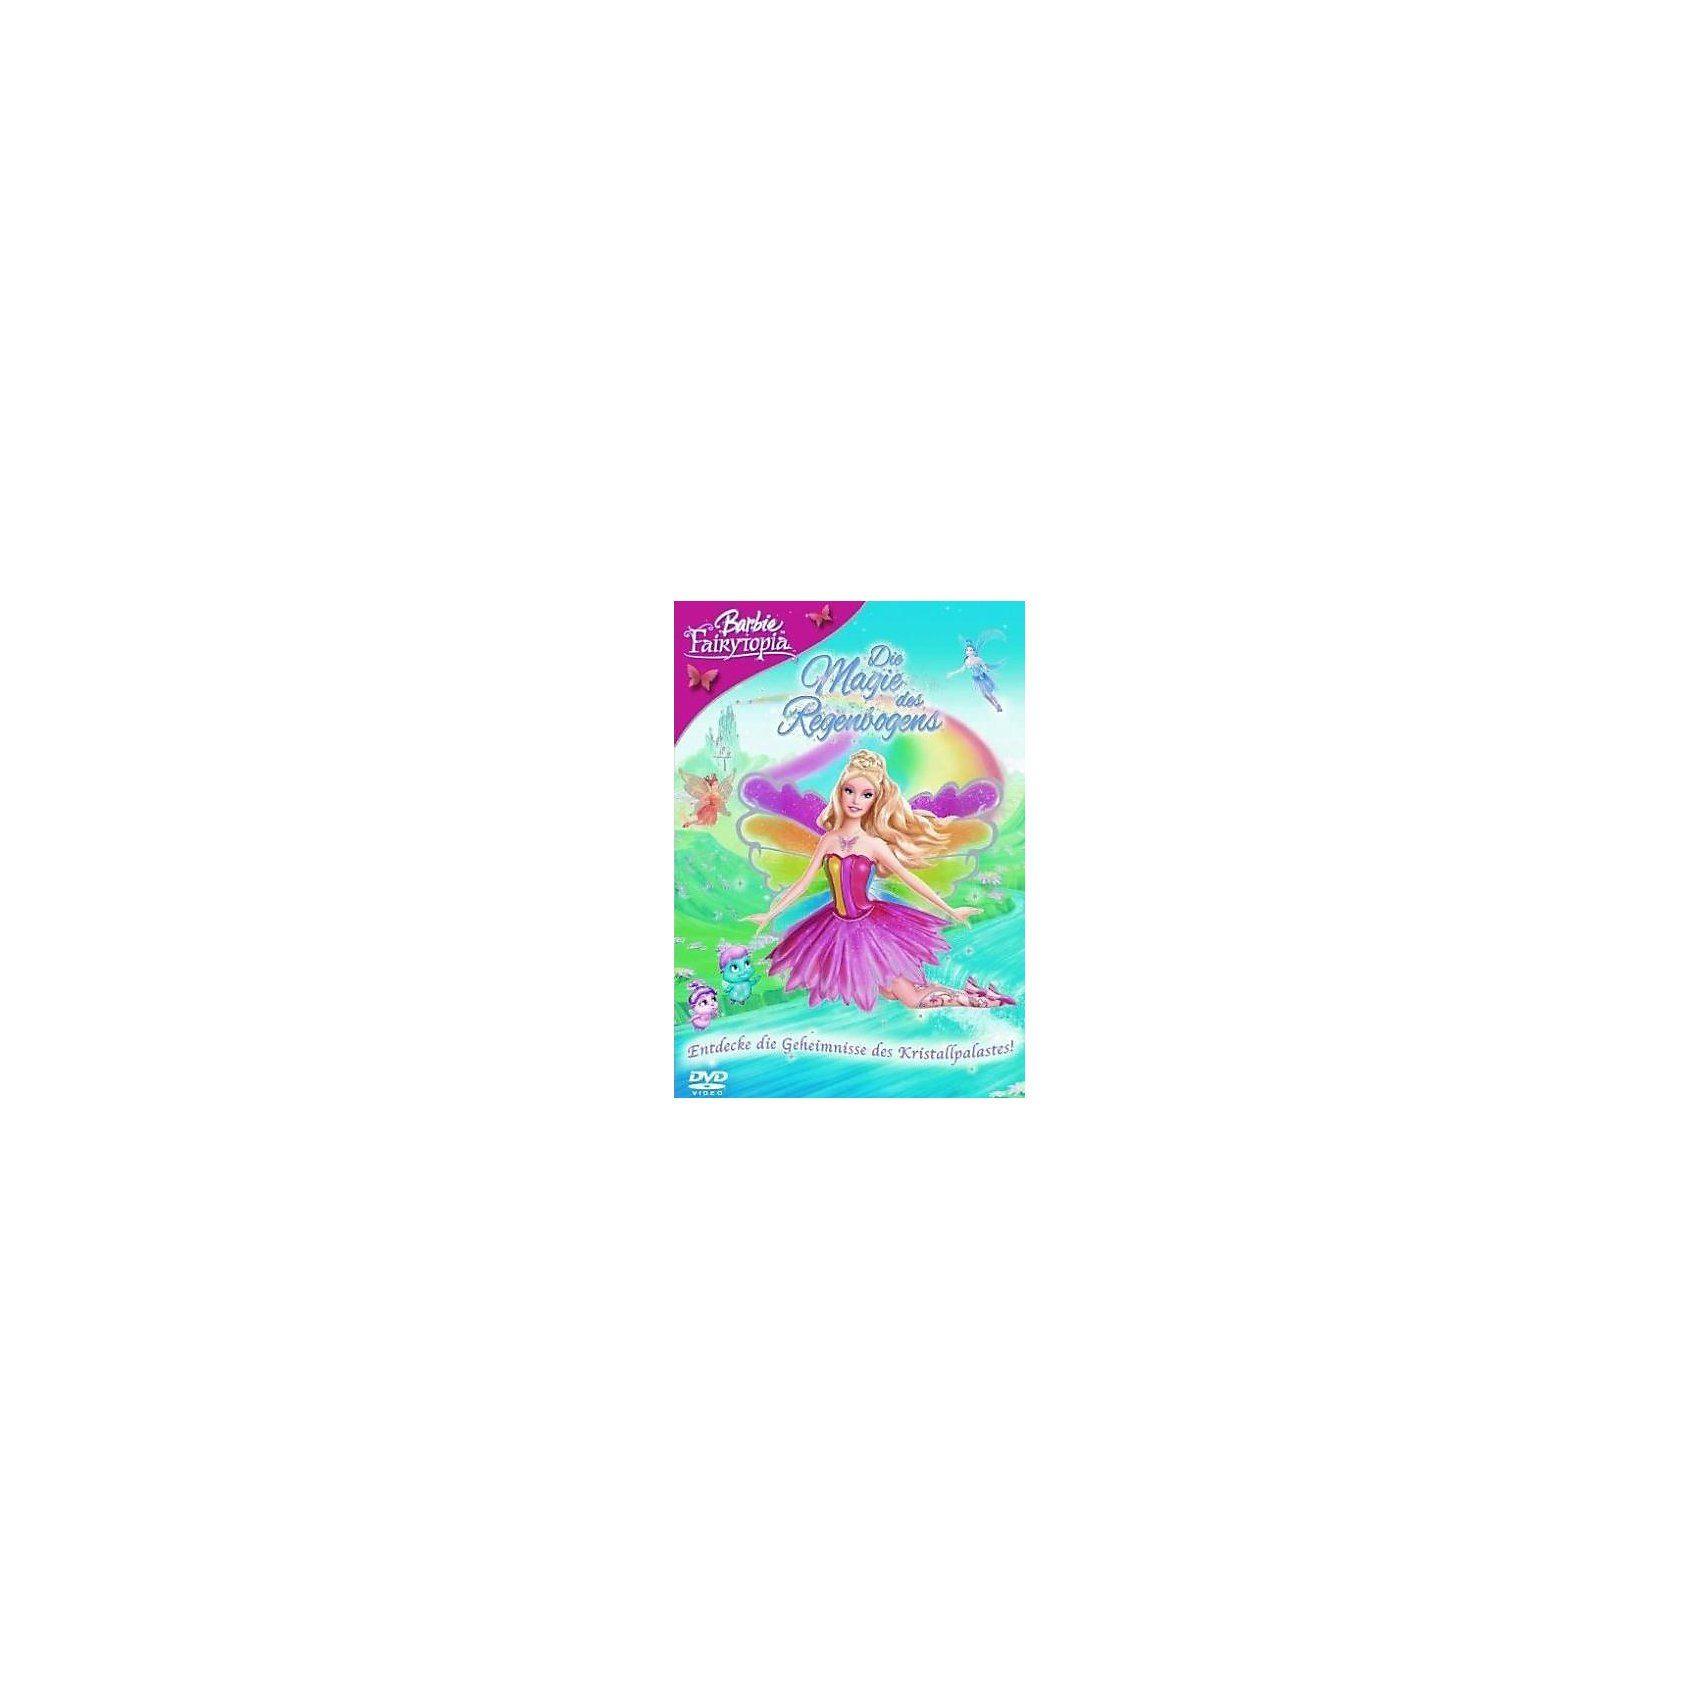 Universal DVD Barbie: Fairytopia - Die Magie des Regenbogens